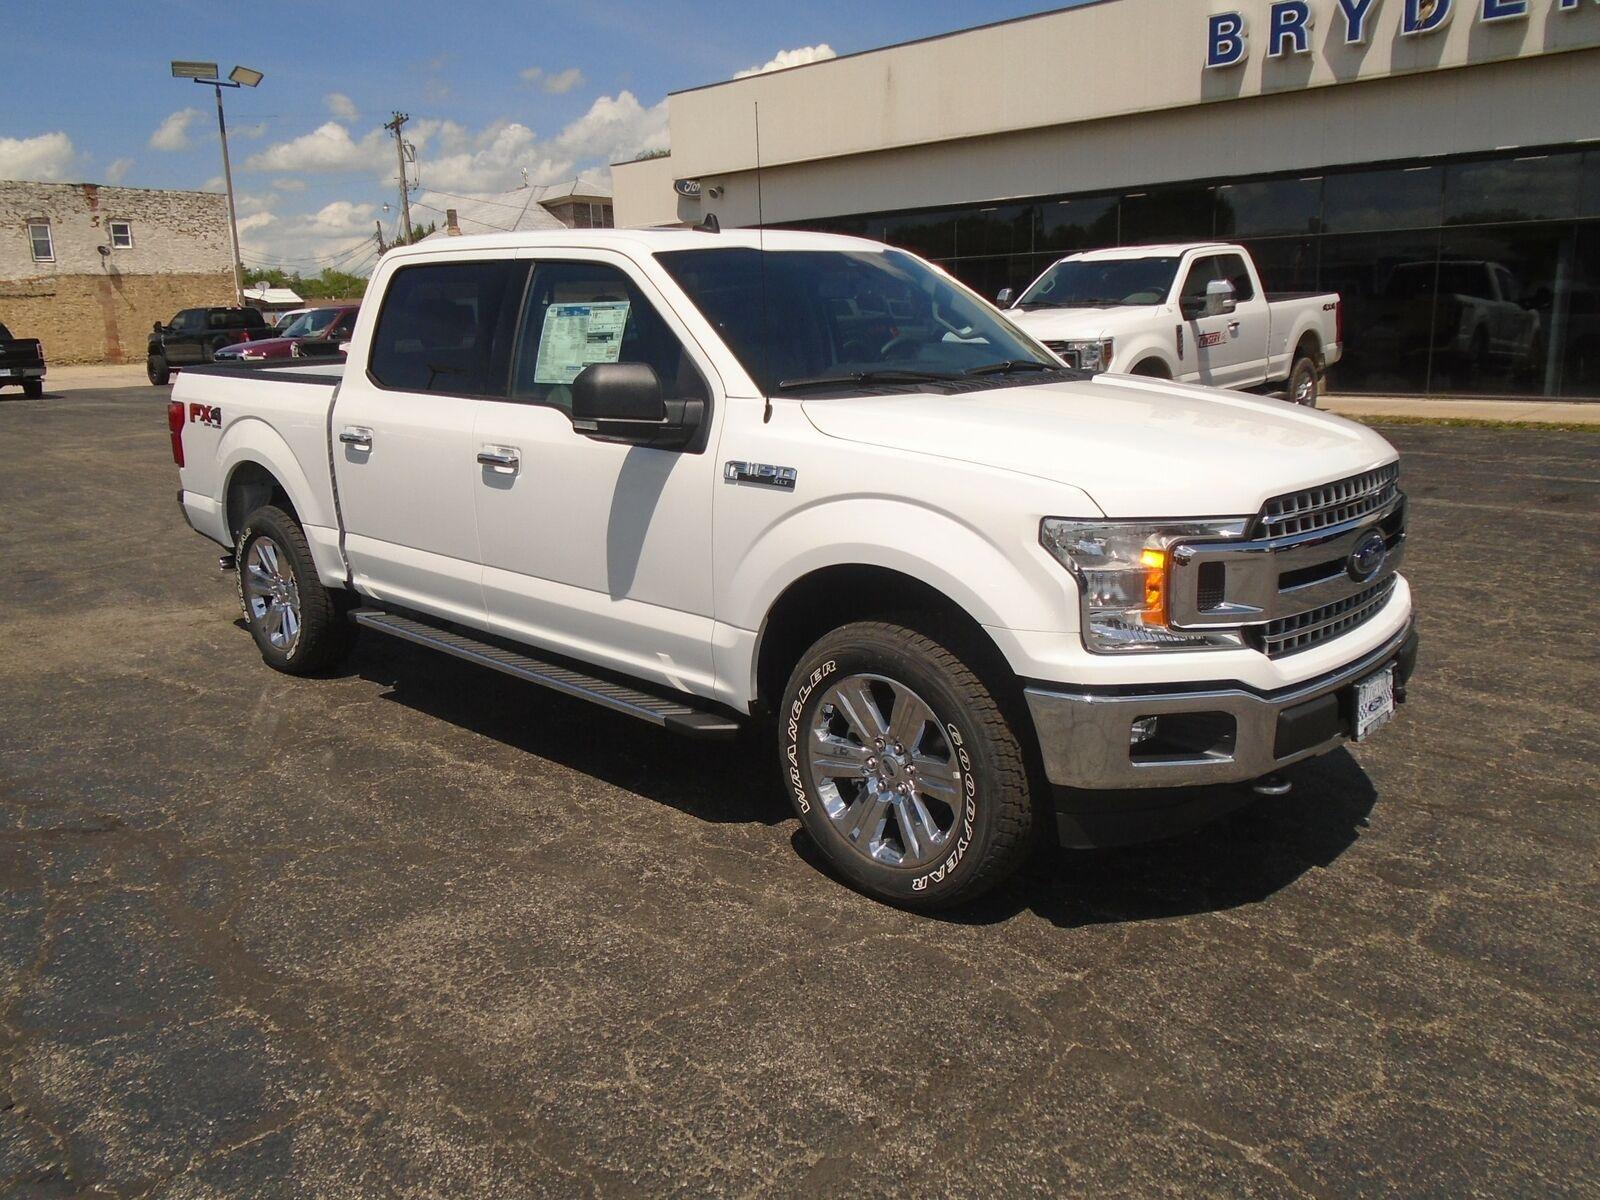 2020 Ford F150 SuperCrew XLT 4X4 233 Miles Oxford White Truck 3.5L V6 EcoBoost w